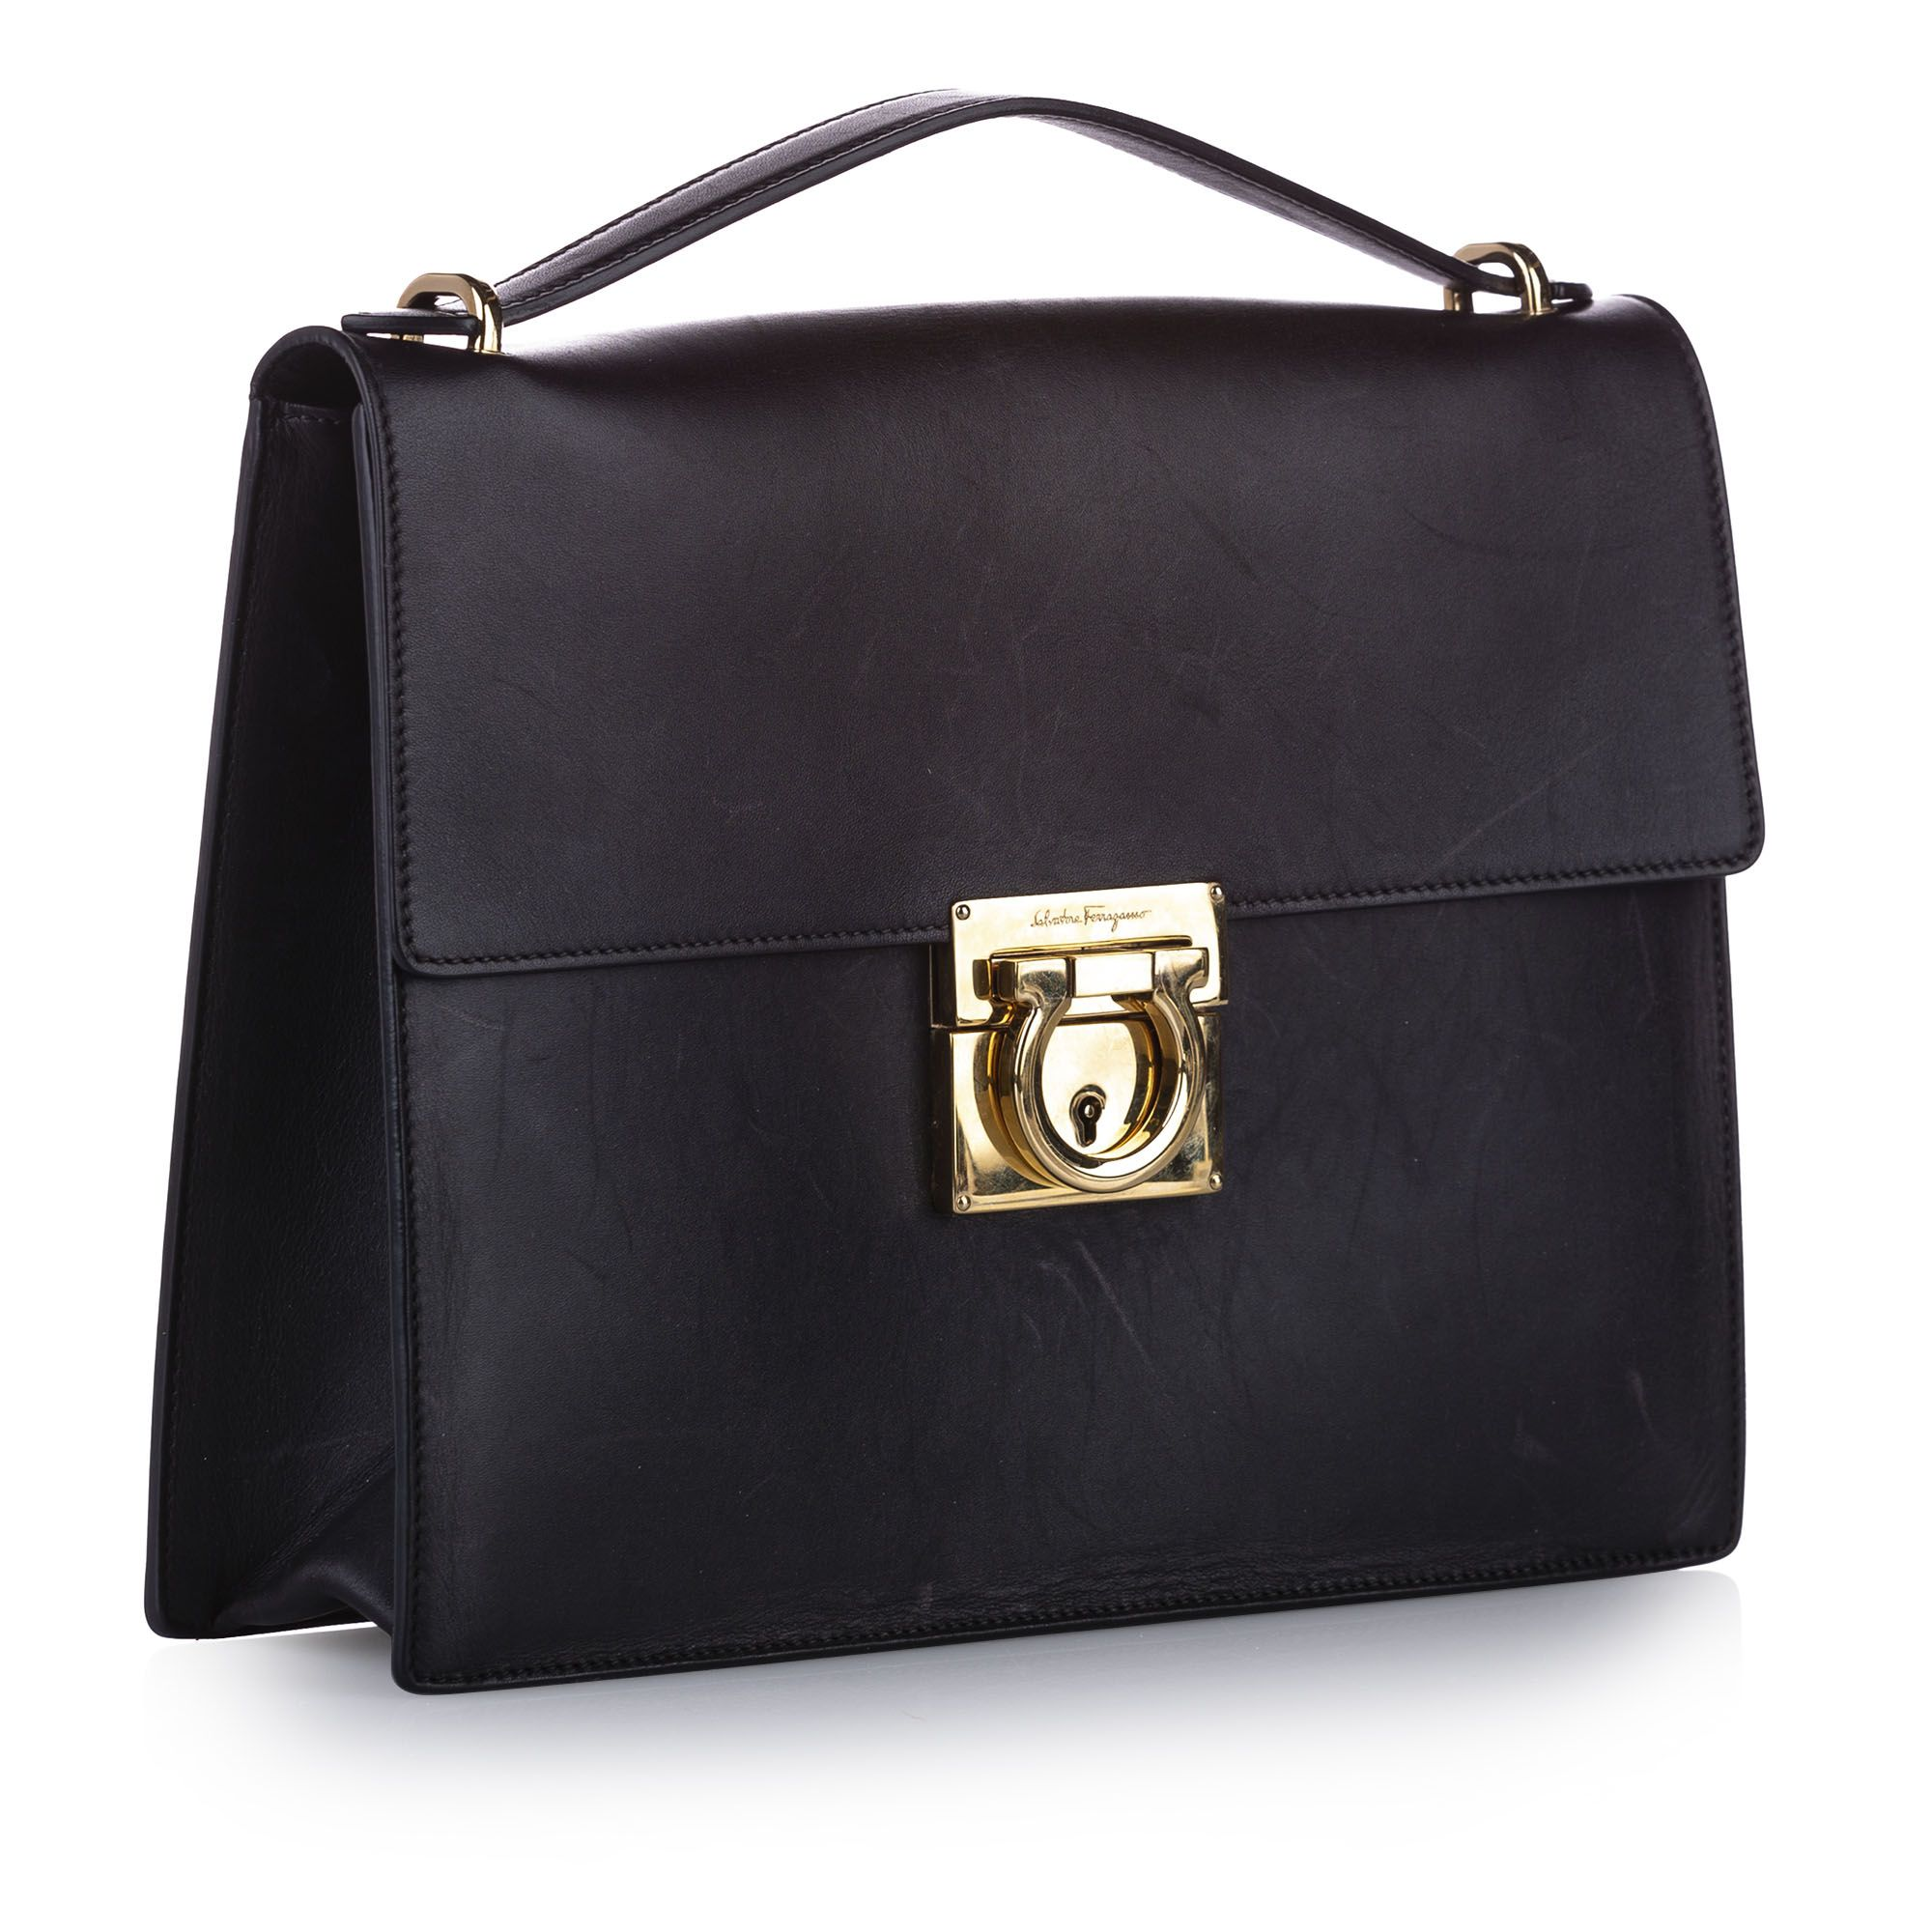 Vintage Ferragamo Gancini Leather Satchel Black